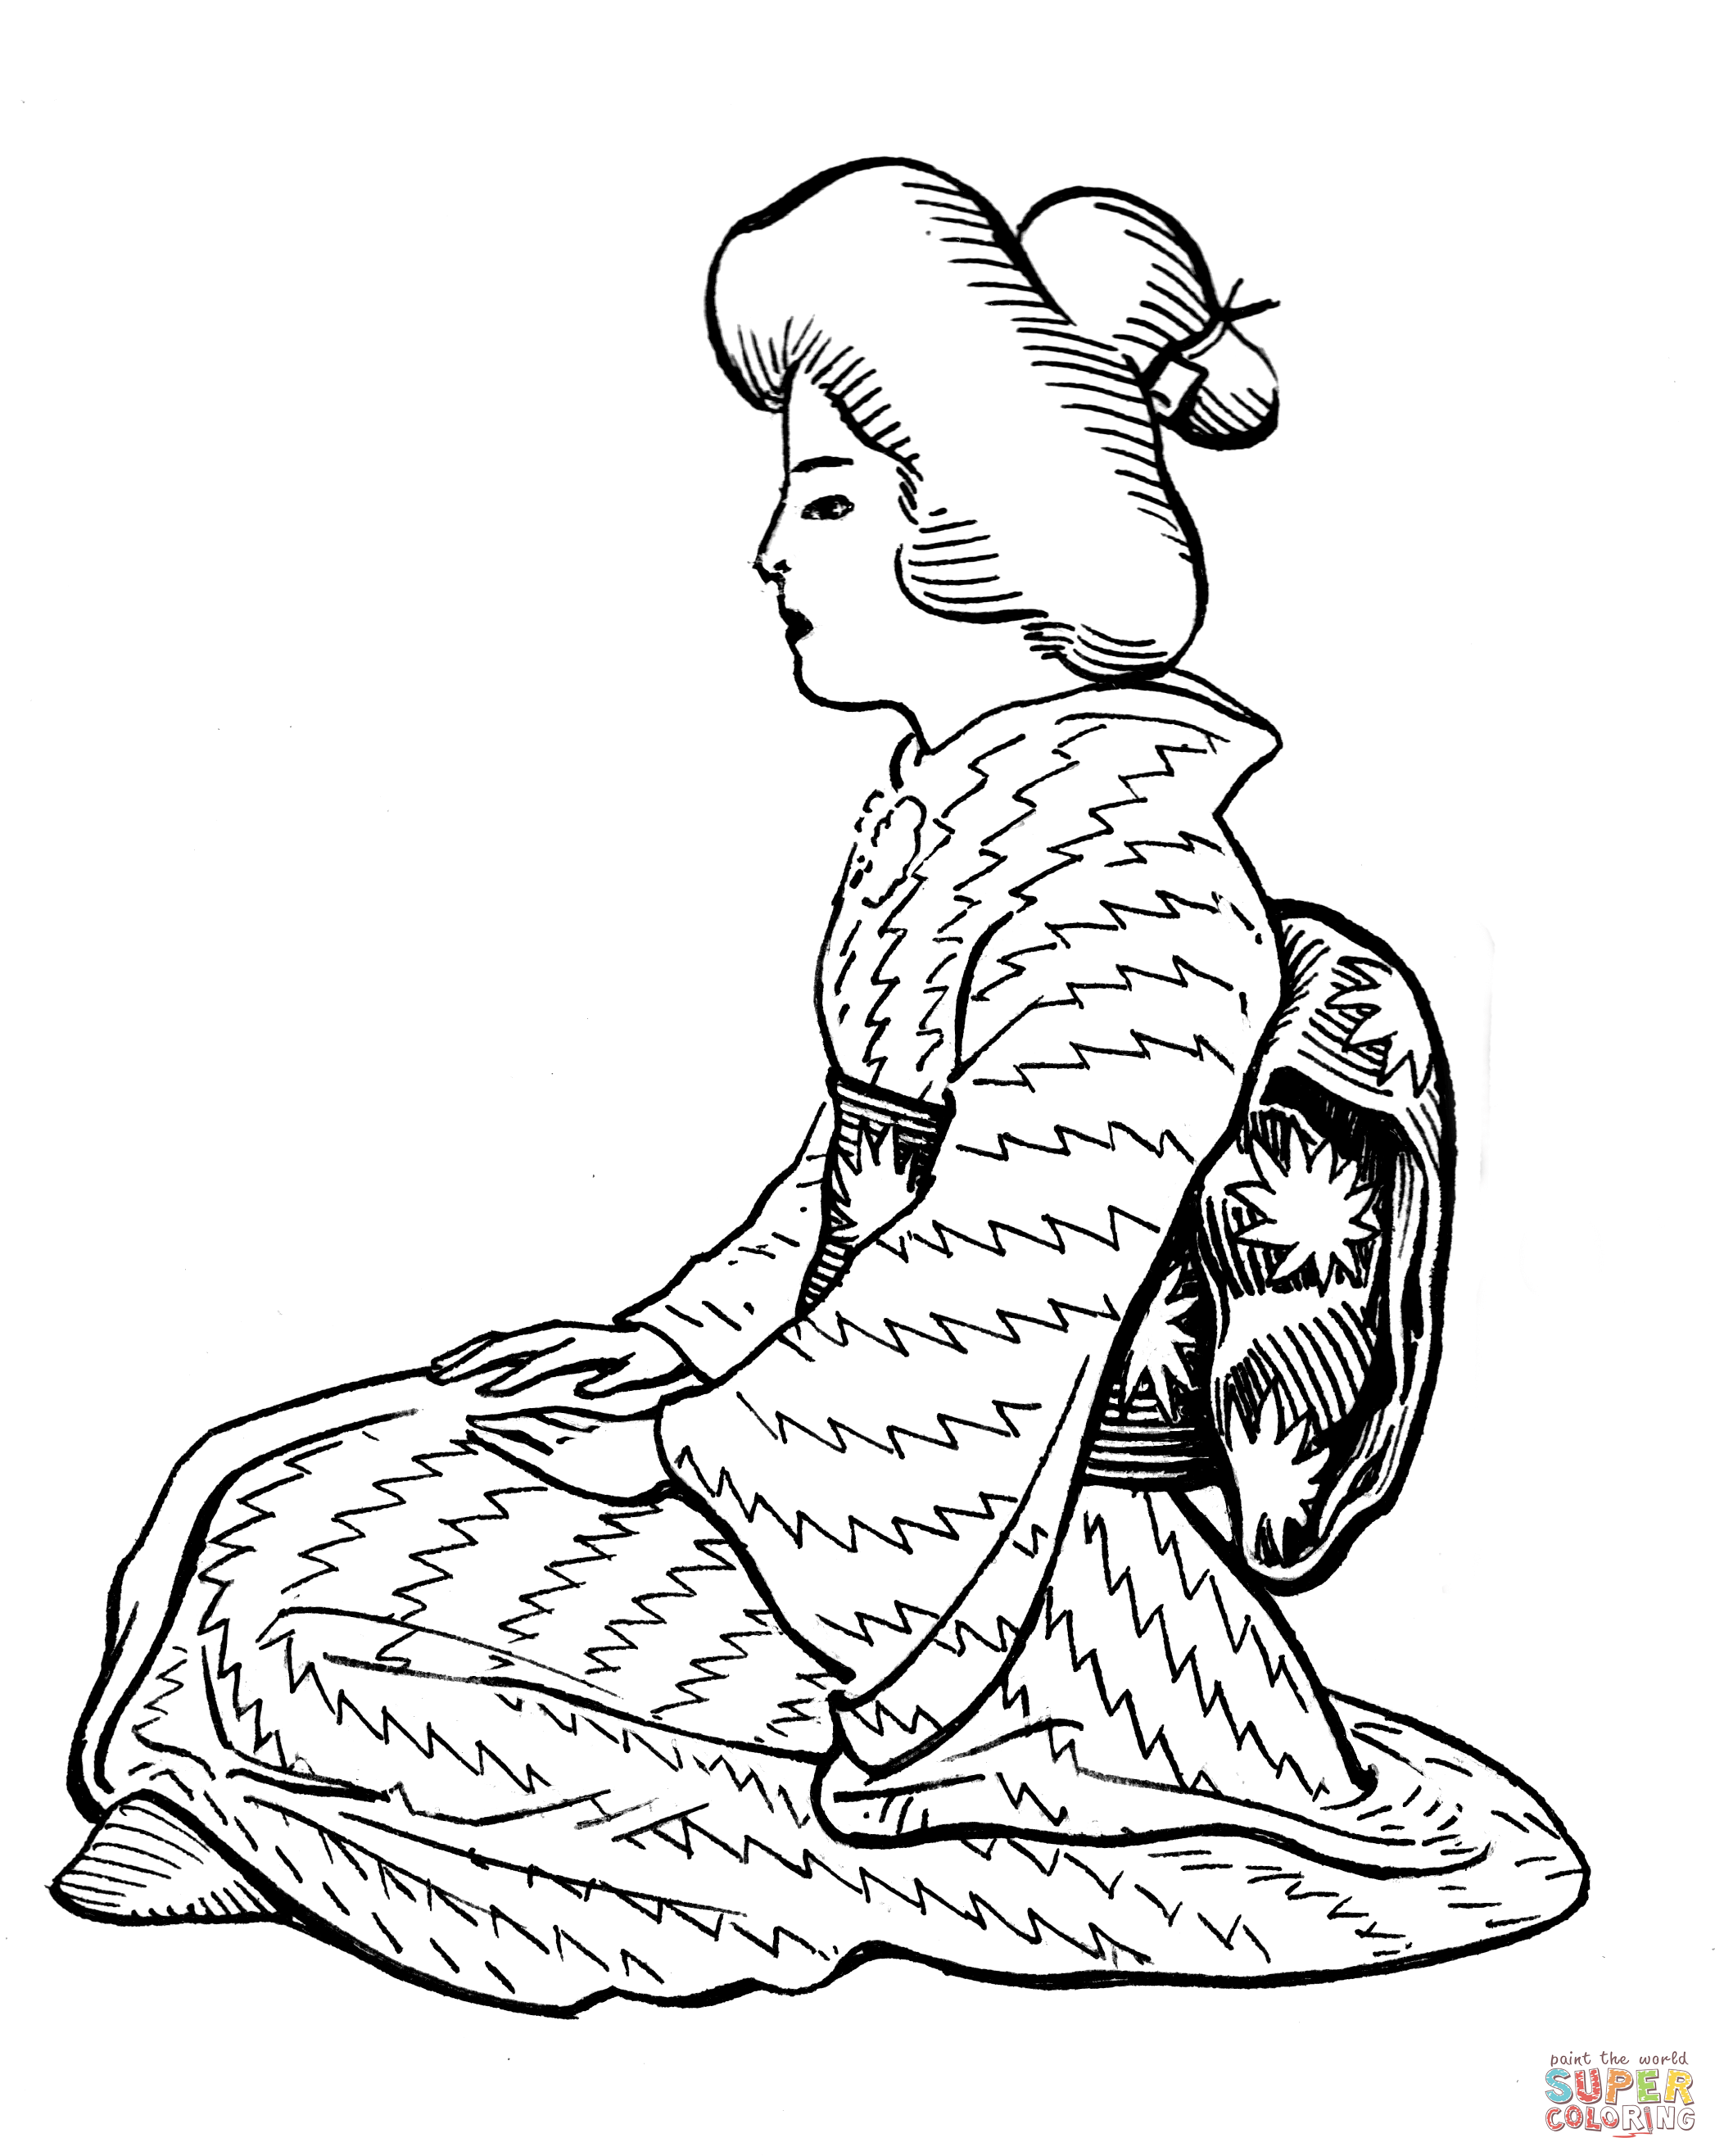 2094x2632 Japanese Woman Wearing Kimono With Obi Sash Coloring Page Free